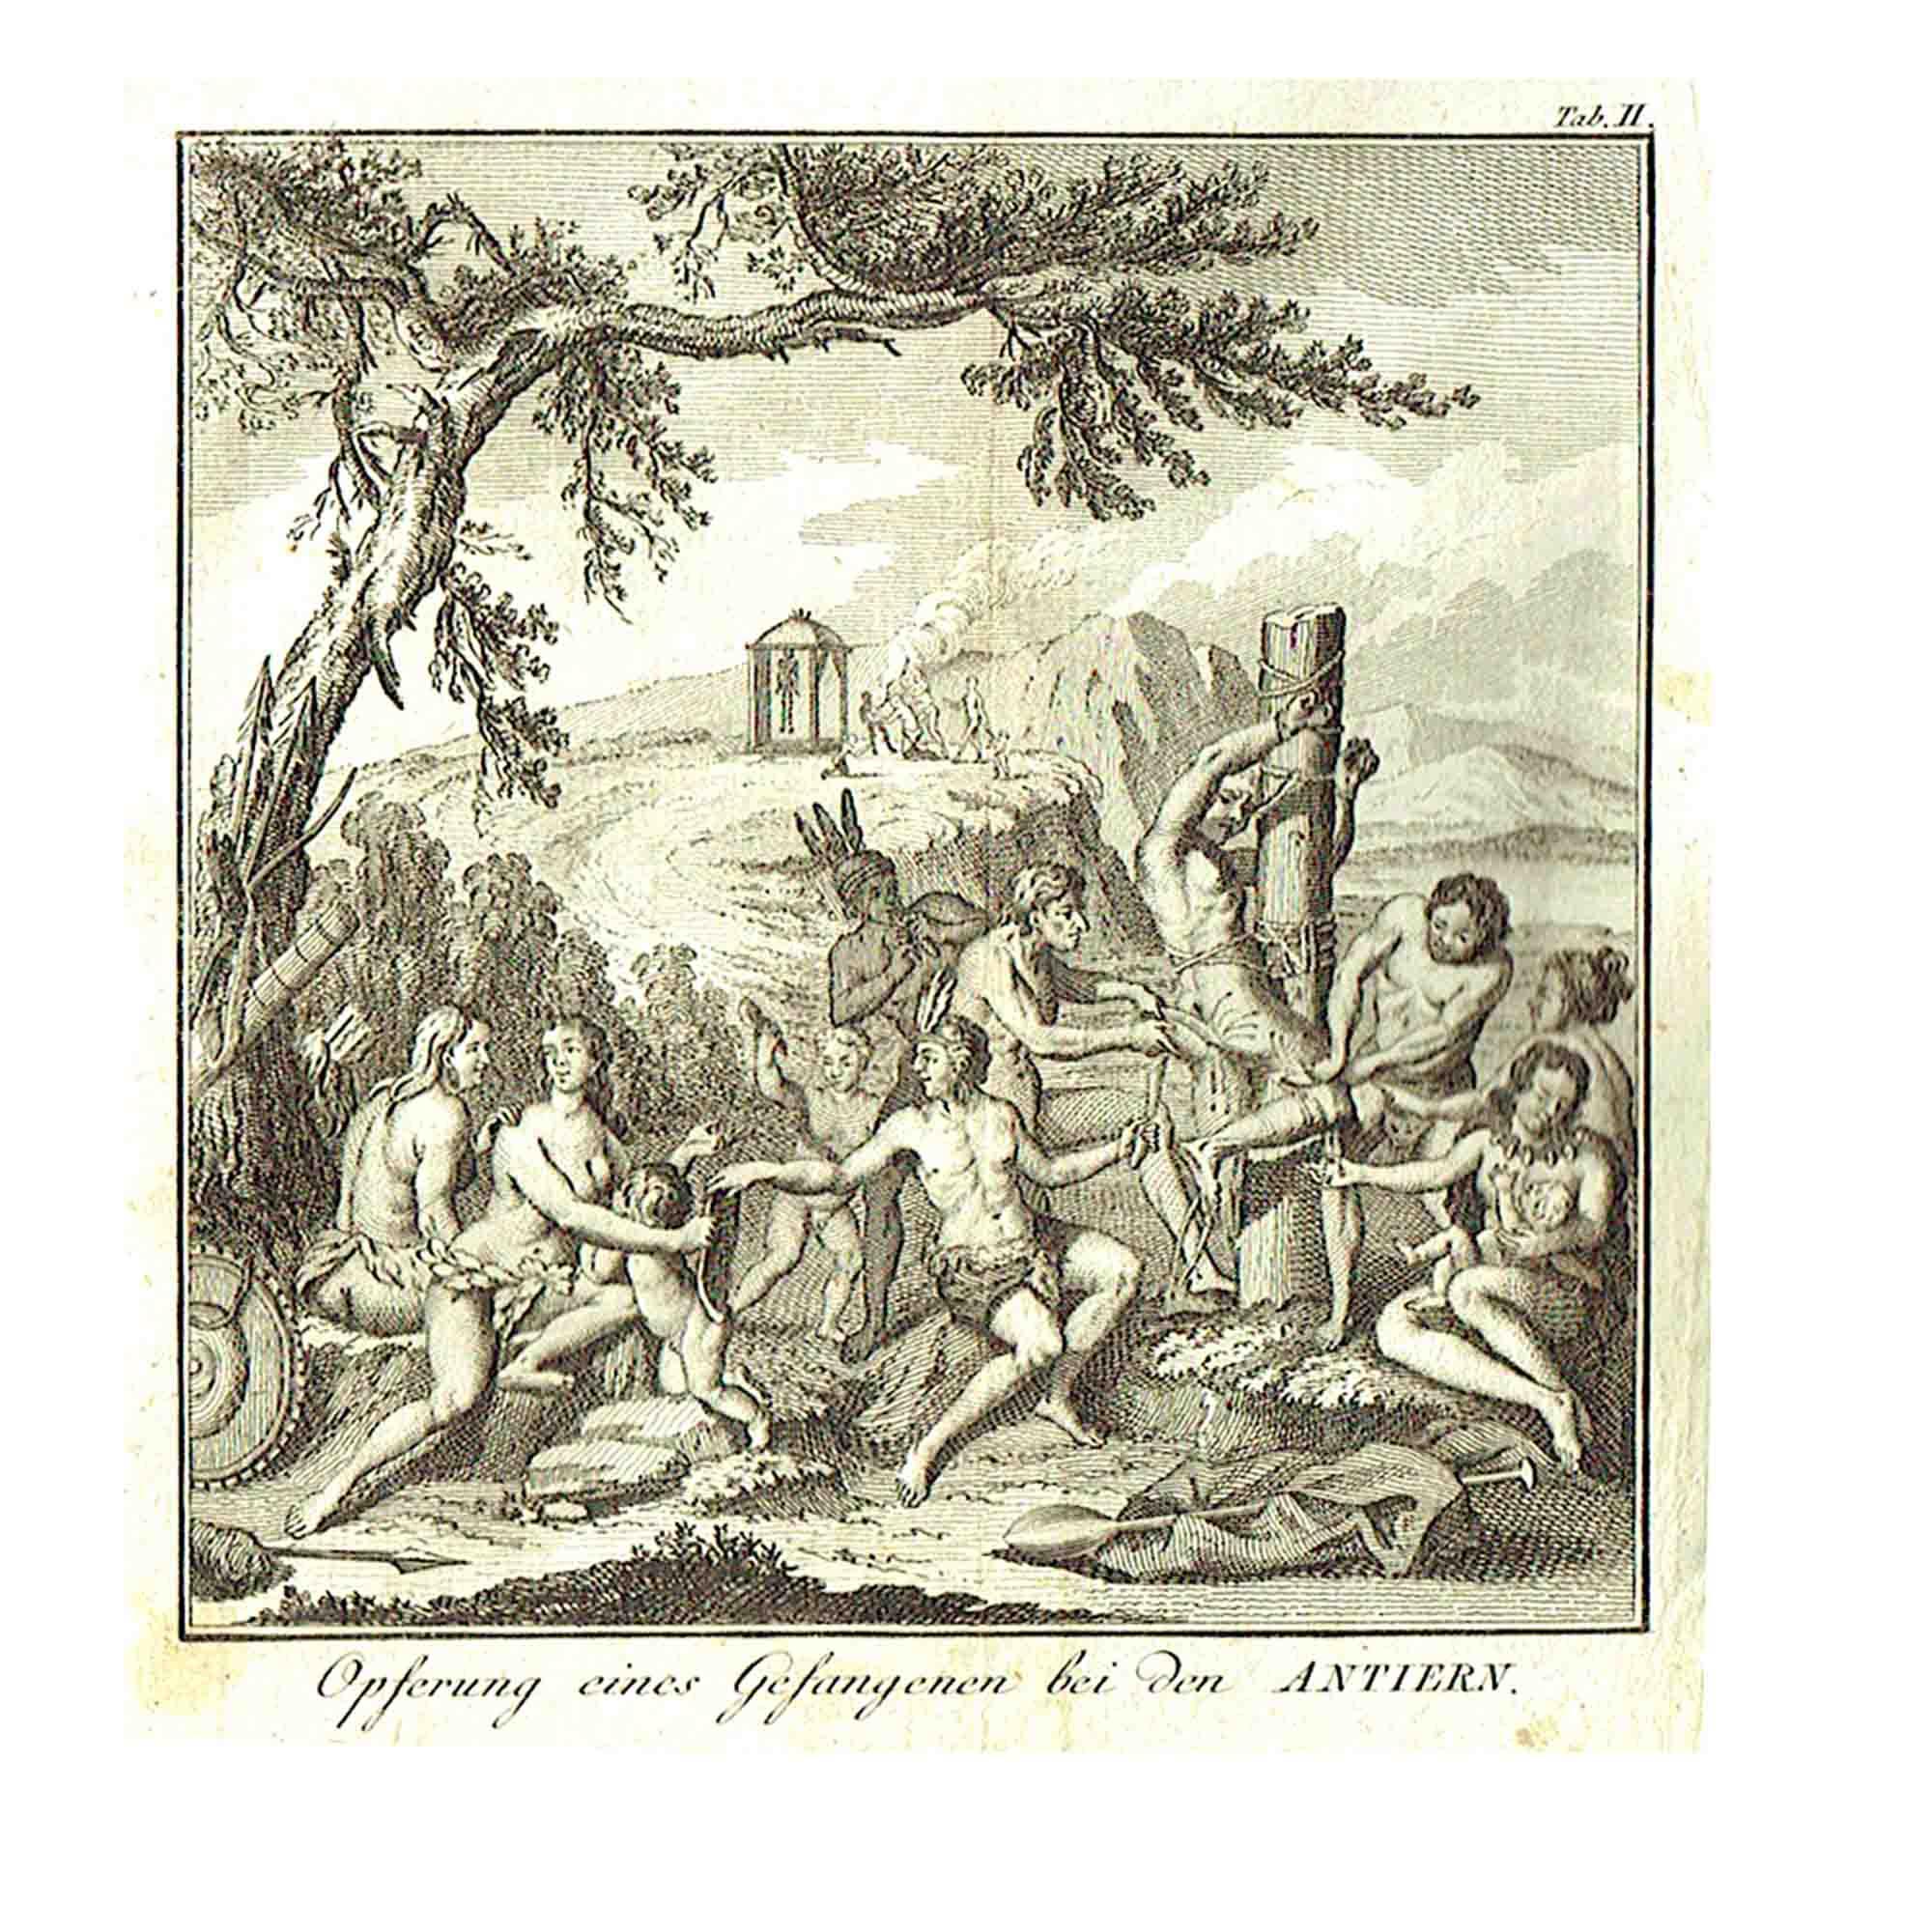 5374-Purmann-Wilden-Amerika-1790-1-N.jpg